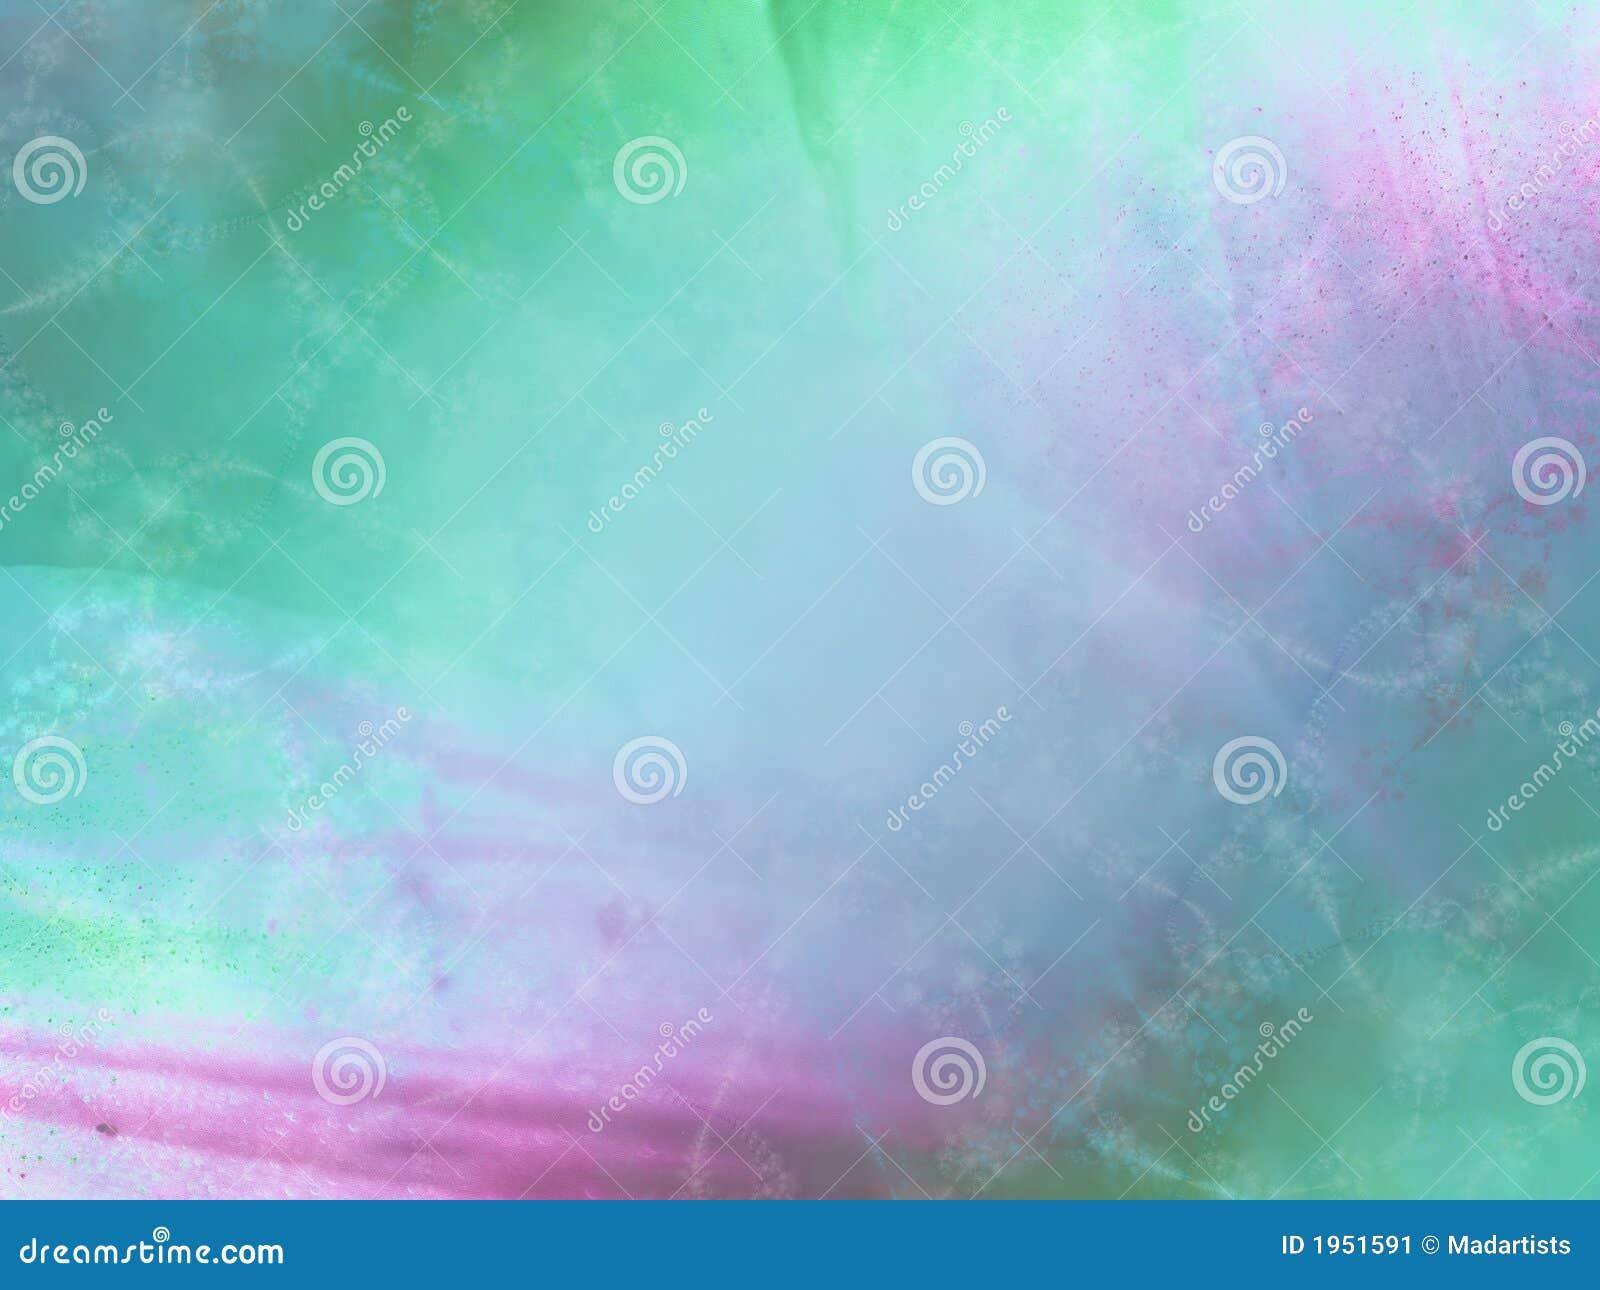 Aqua niebieska fioletowa miękka konsystencja